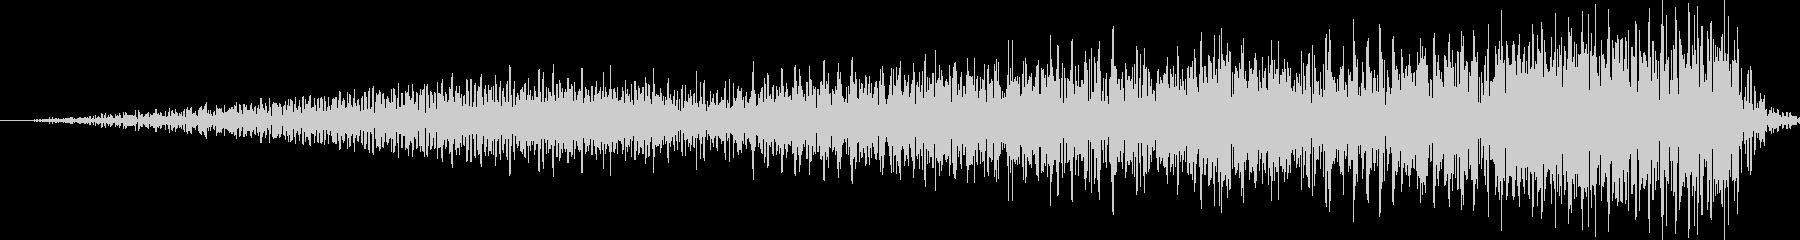 SE 高音ノイズ ギューンUPの未再生の波形